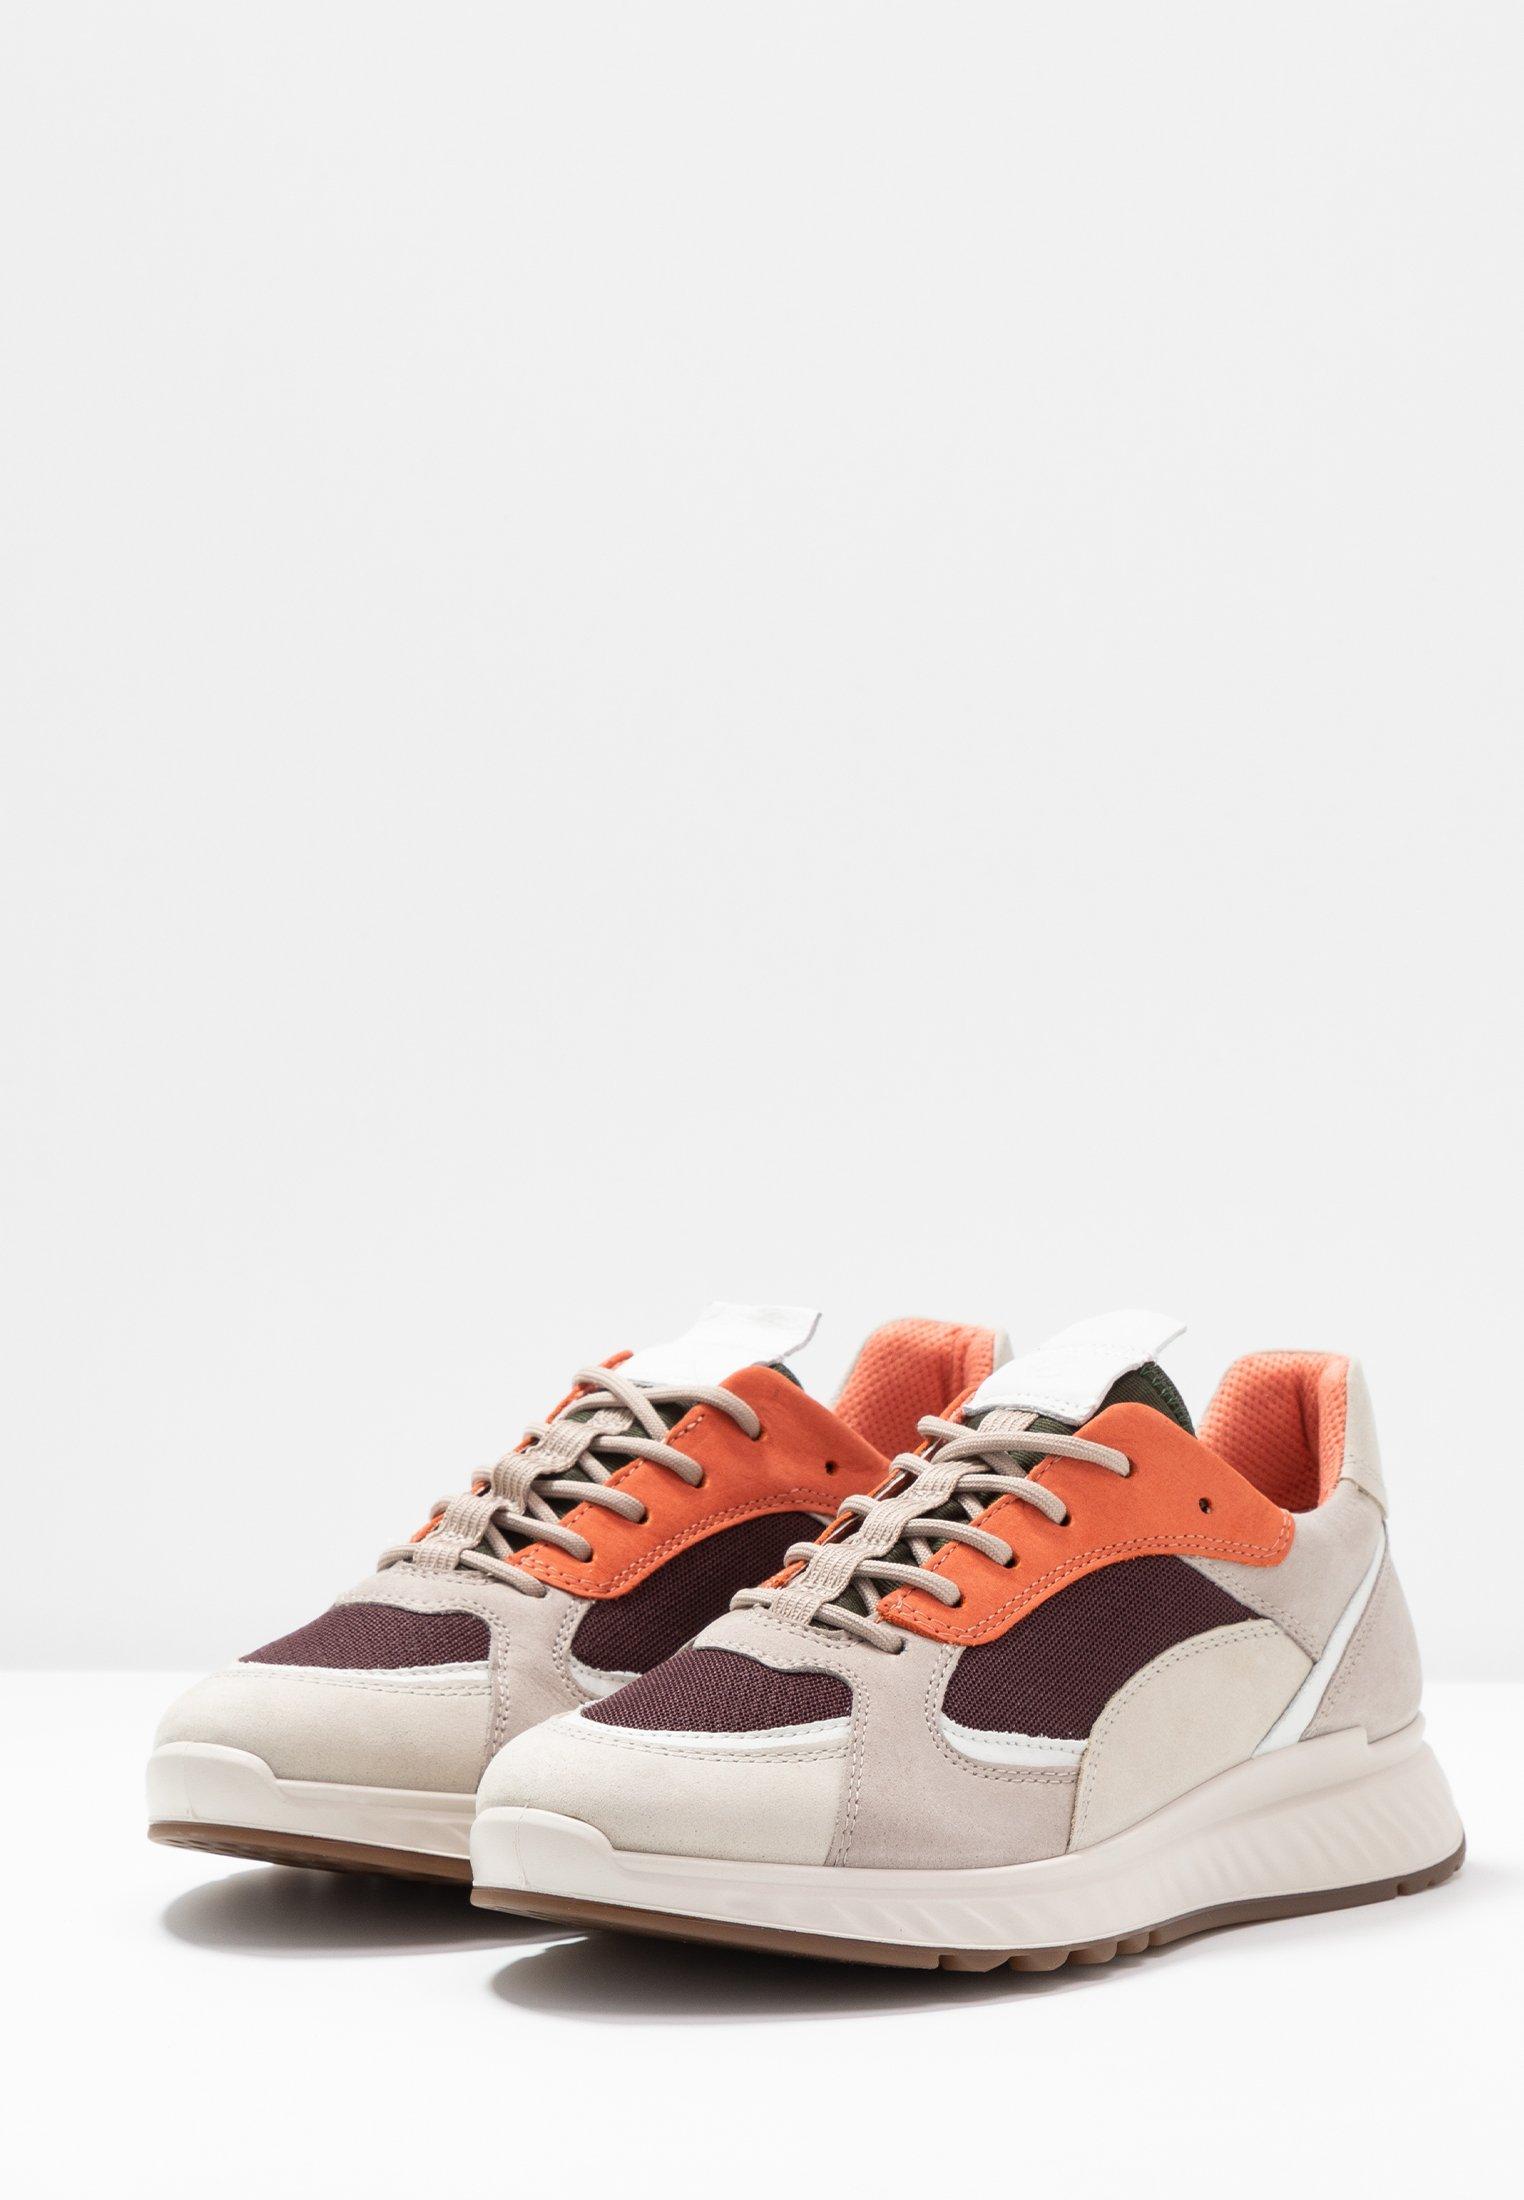 ecco Sneakers basse gravel/white/grey rose/apricot